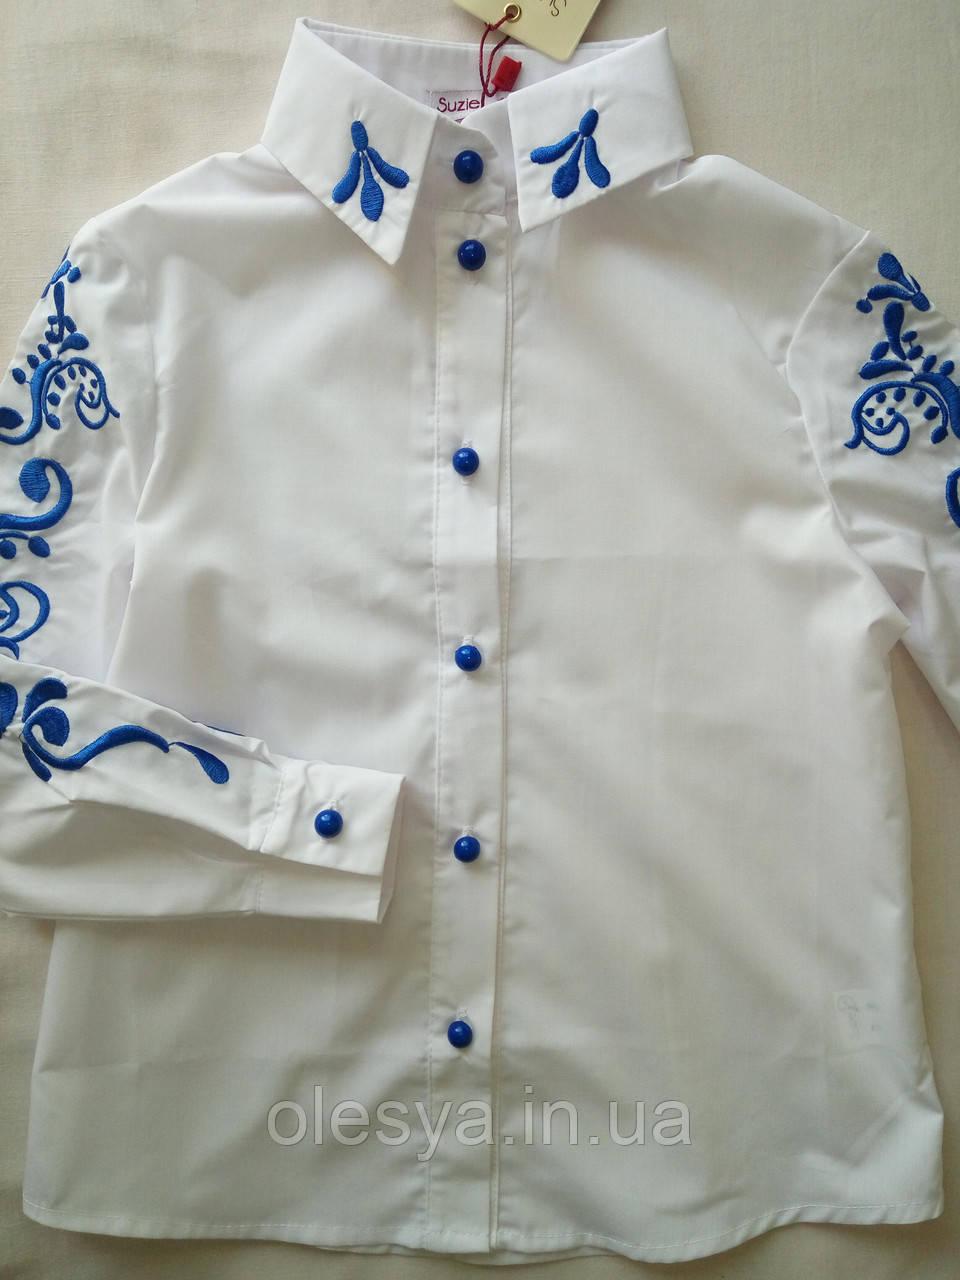 Блуза Suzie Полина школьная нарядная вышивка цвет электрик Размер 134